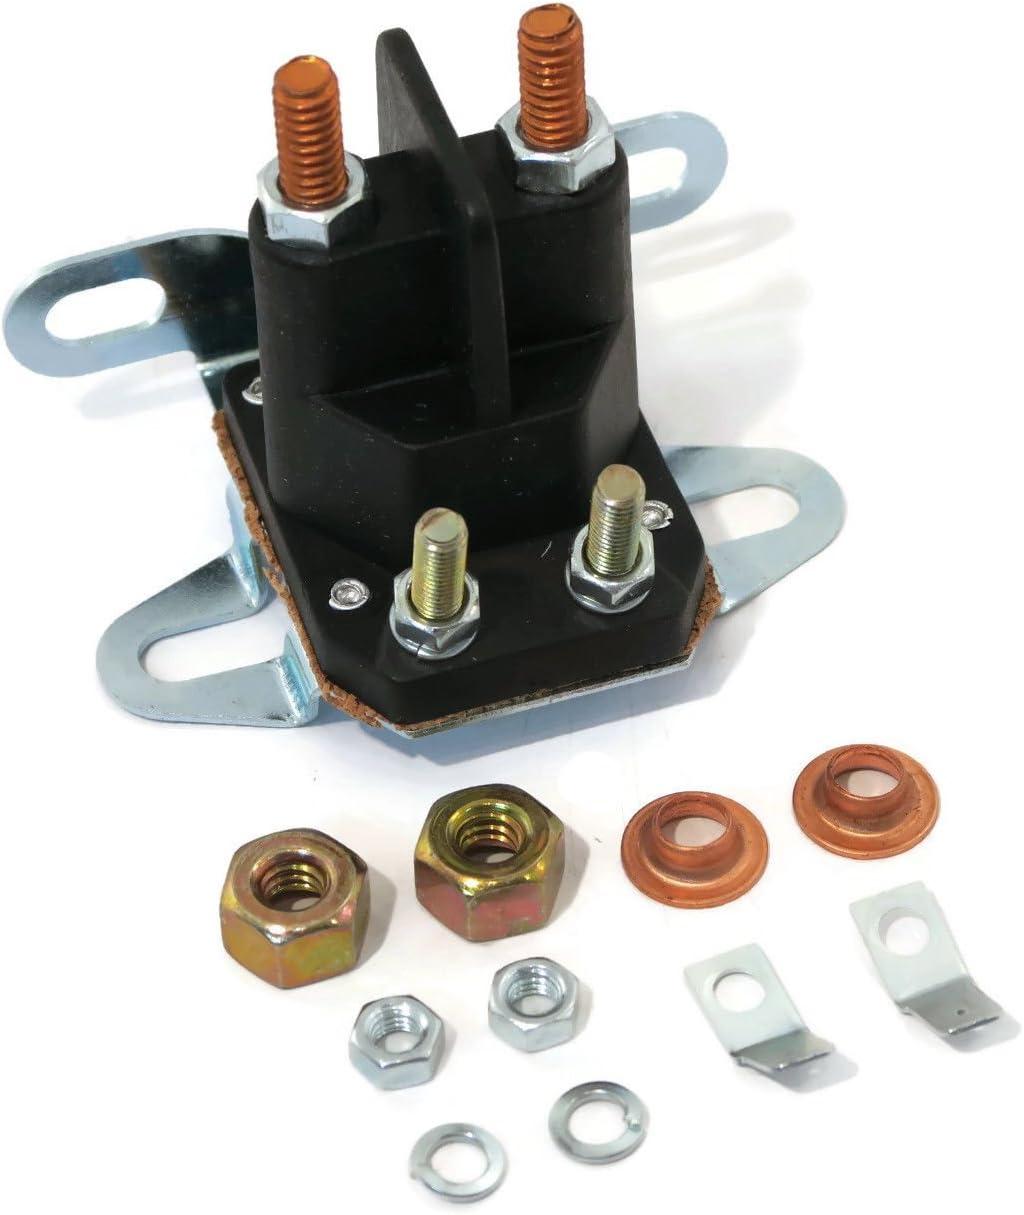 The ROP Shop Starter Solenoid for John Deere L100 L110 L118 L120 L130 Mower AM133094 AM138497